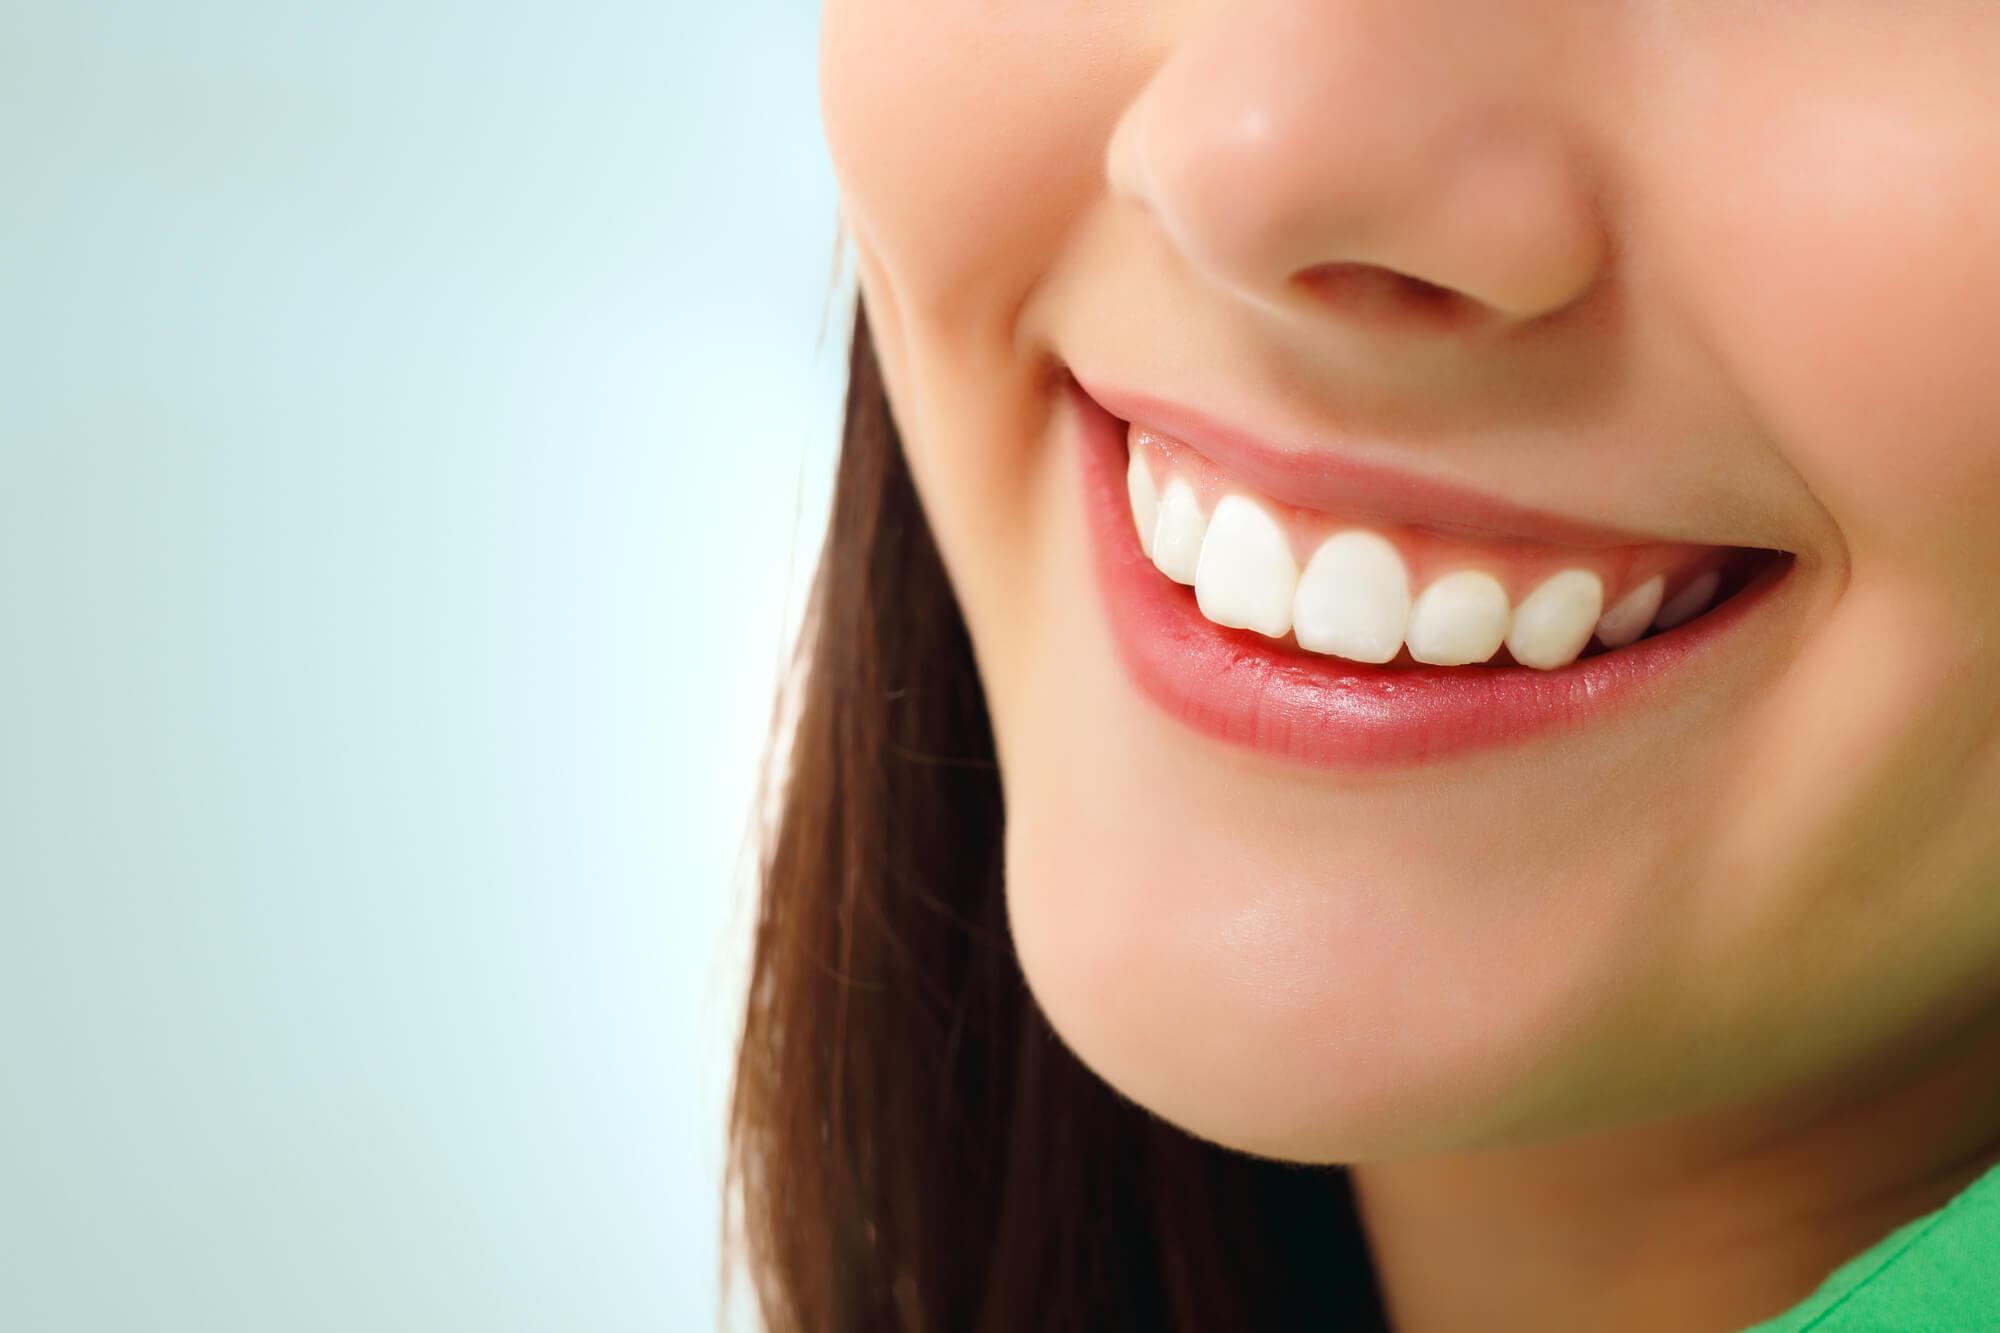 where is the best dentist near fiu?